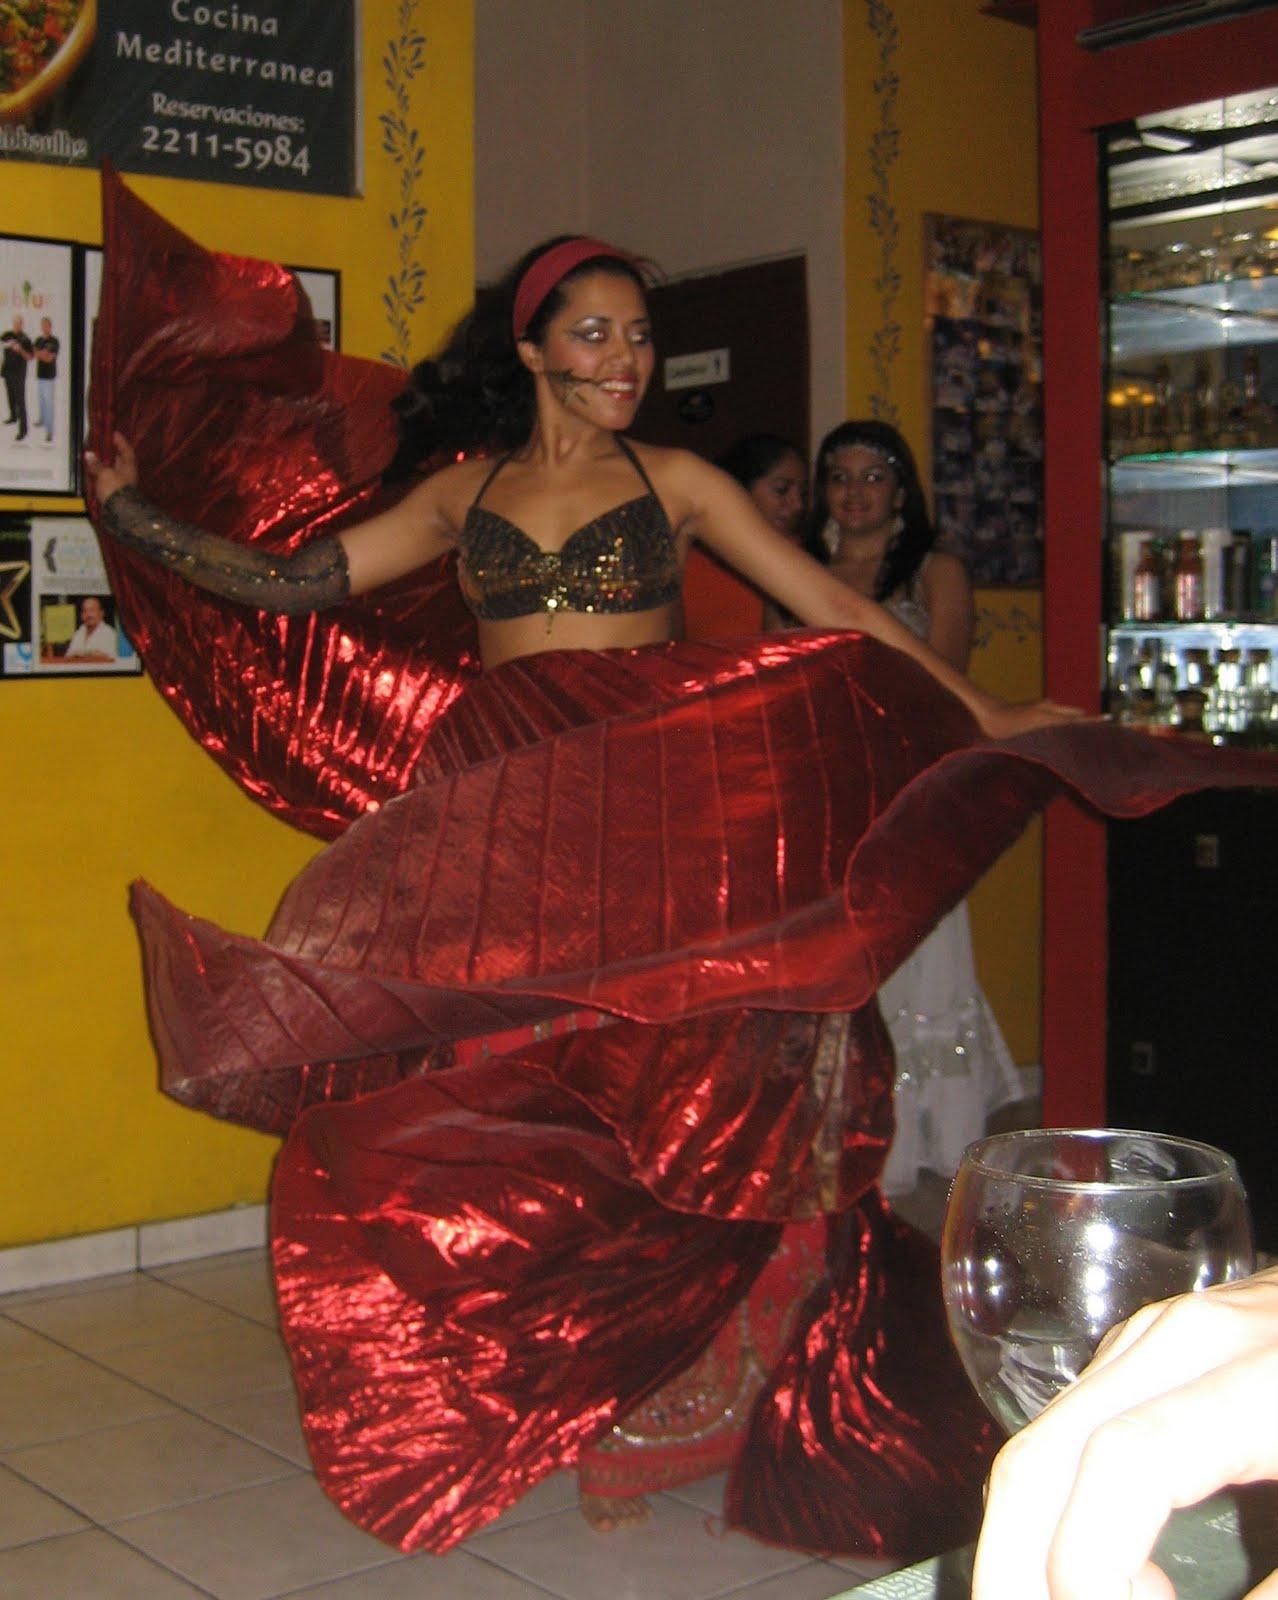 http://1.bp.blogspot.com/_B_ERTG0NUgM/TCytLC_2OII/AAAAAAAAAIs/Z2XJi9GaSxg/s1600/Belly+dancing+004.jpg